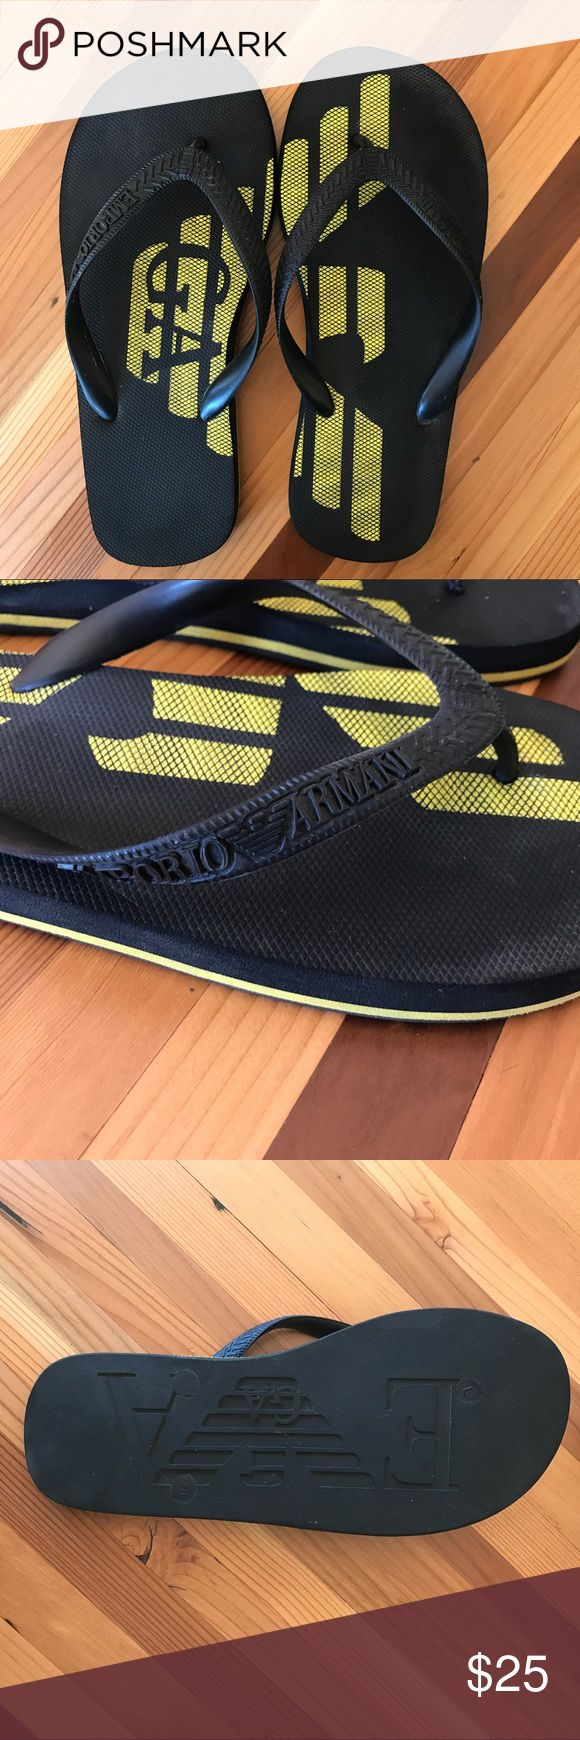 Mens Giorgio Armani Flip Flops Black flip flops with yellow logo detail. Great condition, barely worn. Giorgio Armani Shoes Sandals & Flip-Flops